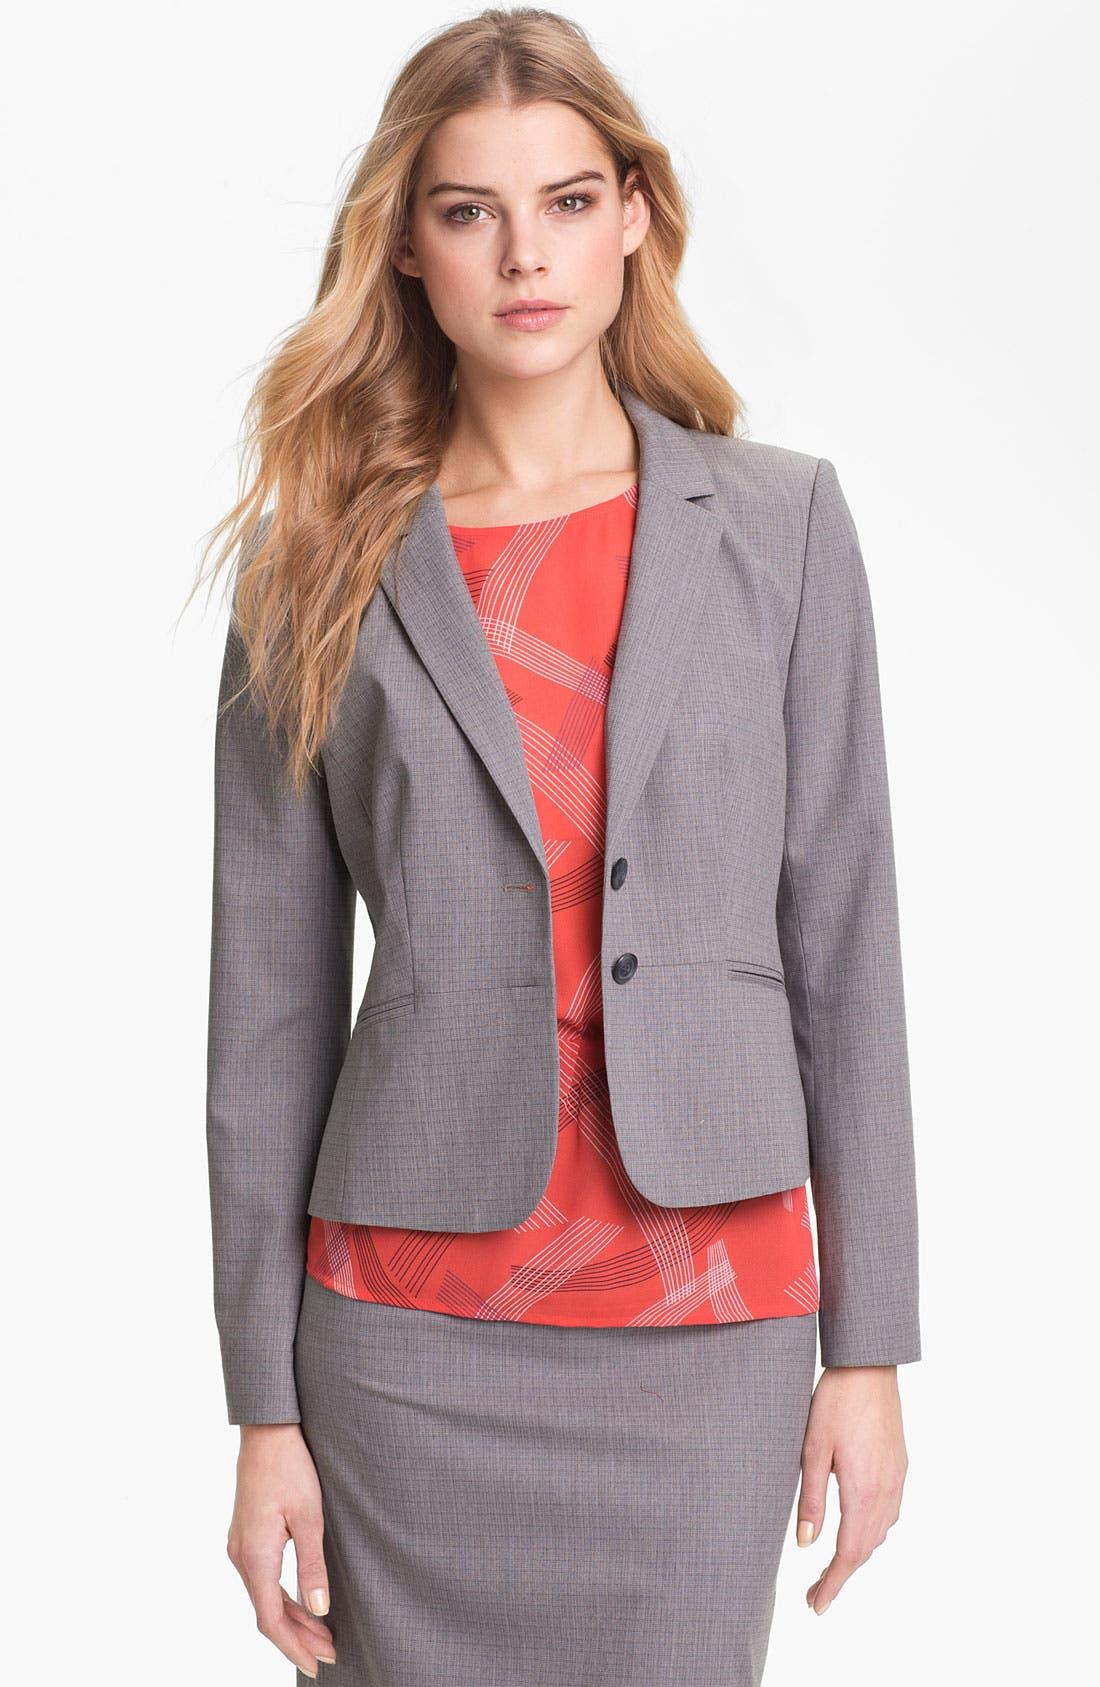 Alternate Image 1 Selected - Halogen® Tonal Texture Suiting Jacket